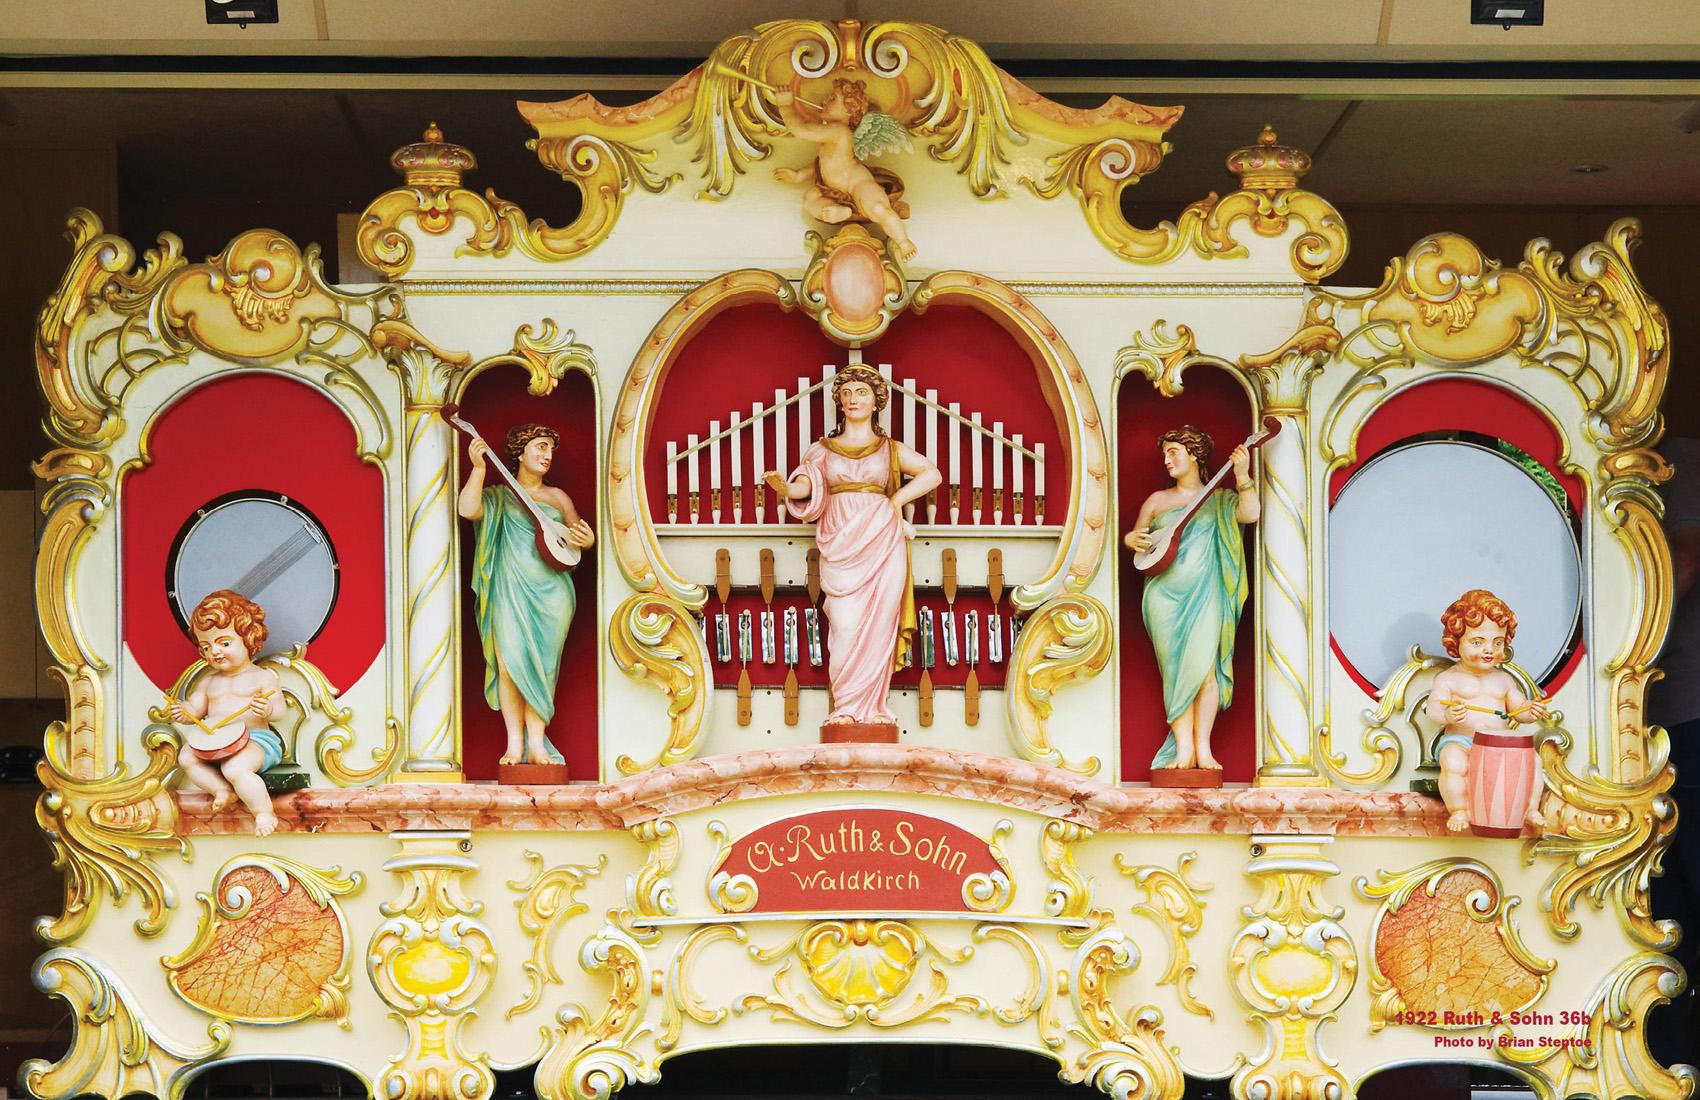 1922-Ruth-Sohn-36b-band-organ-CNT-center-OCT-08